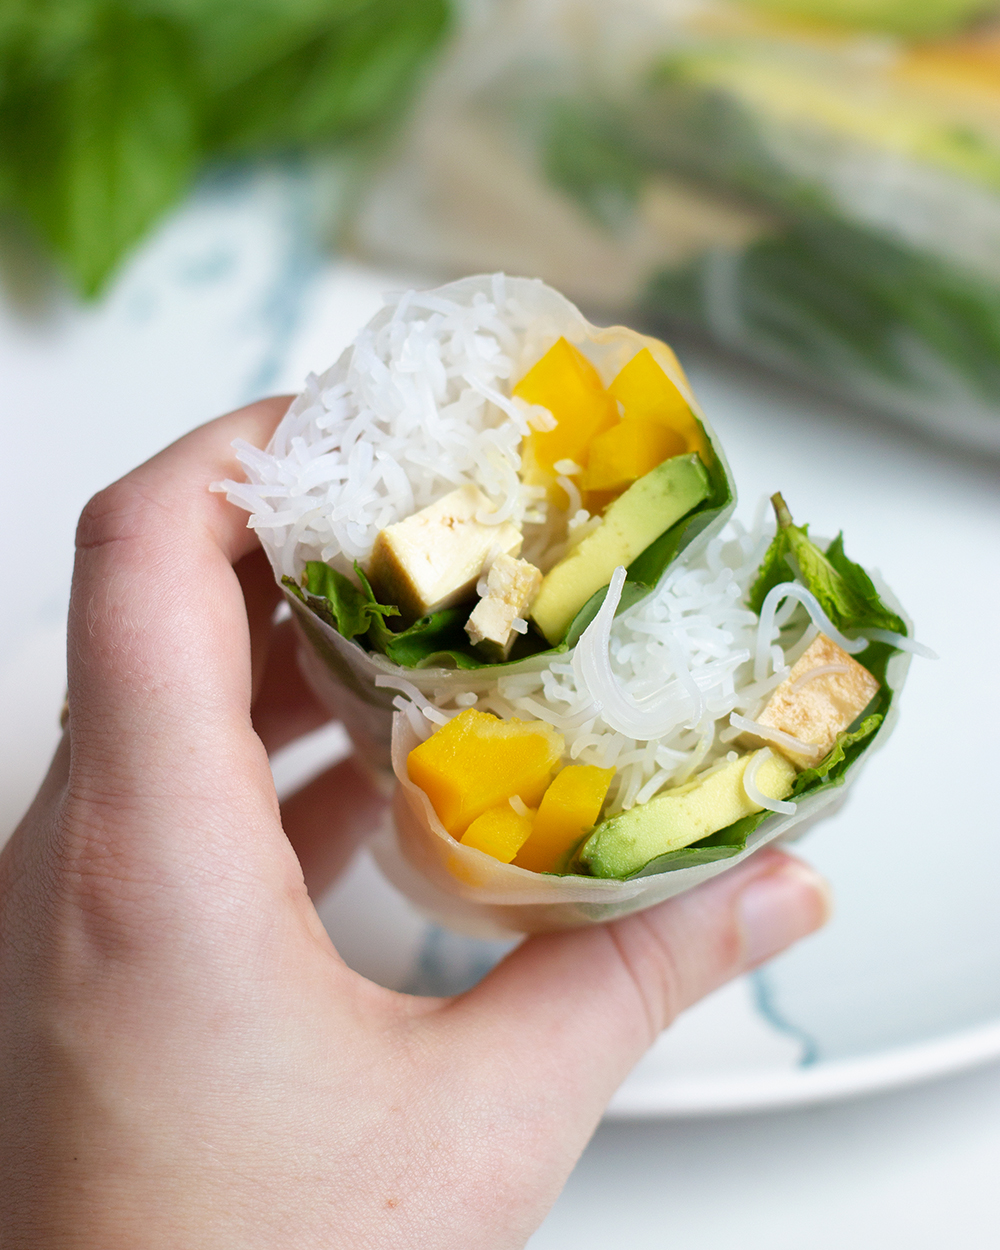 livvyland-blog-olivia-watson-austin-texas-lifestyle-blog-vegetarian-tofu-spring-rolls-peanut-sauce-elizabeth-street-cafe-recipe-3